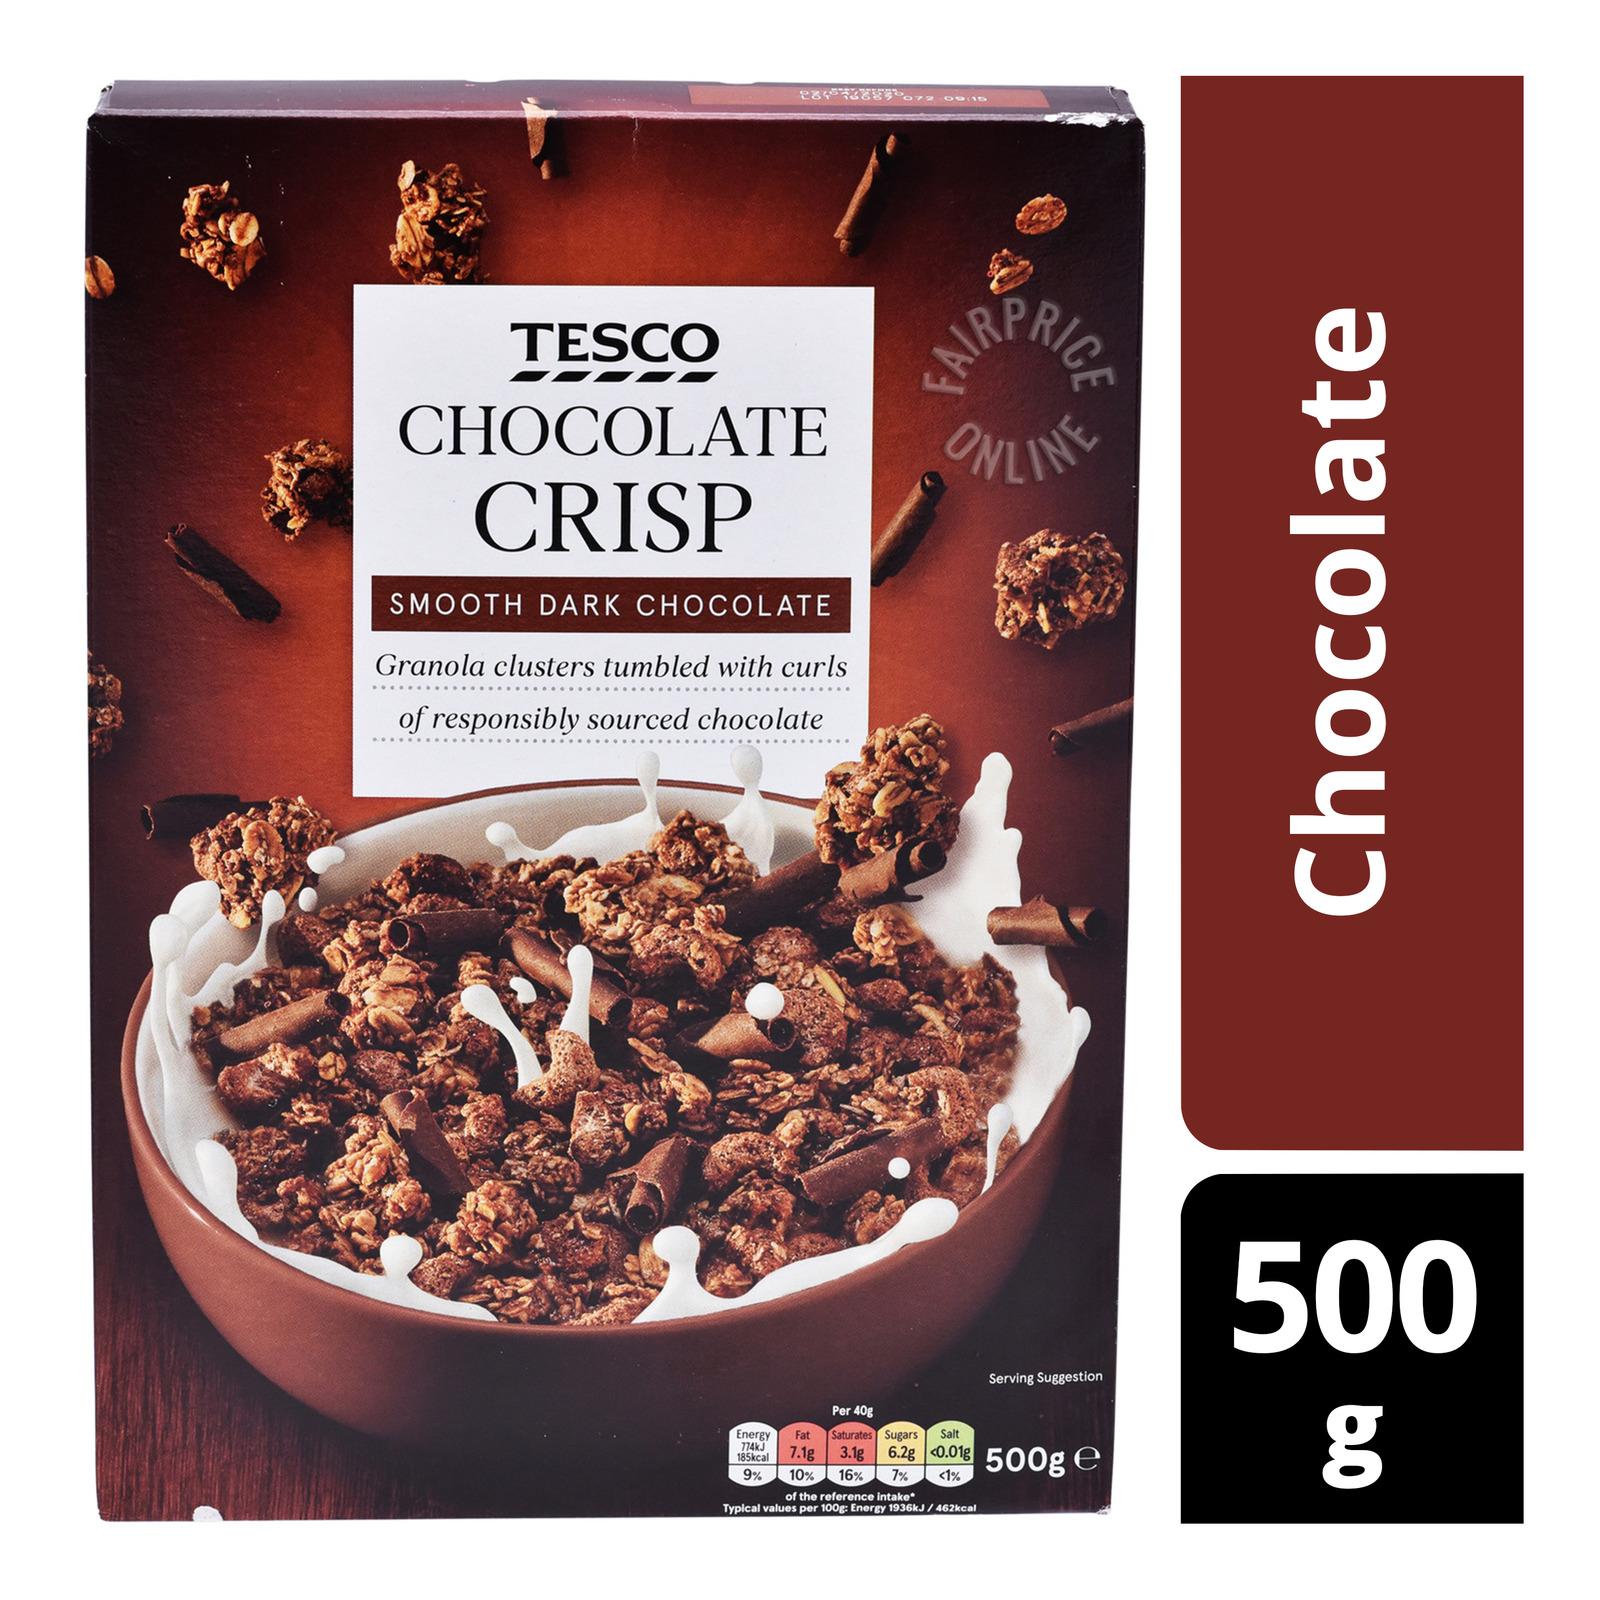 Tesco Crisp Cereal - Chocolate